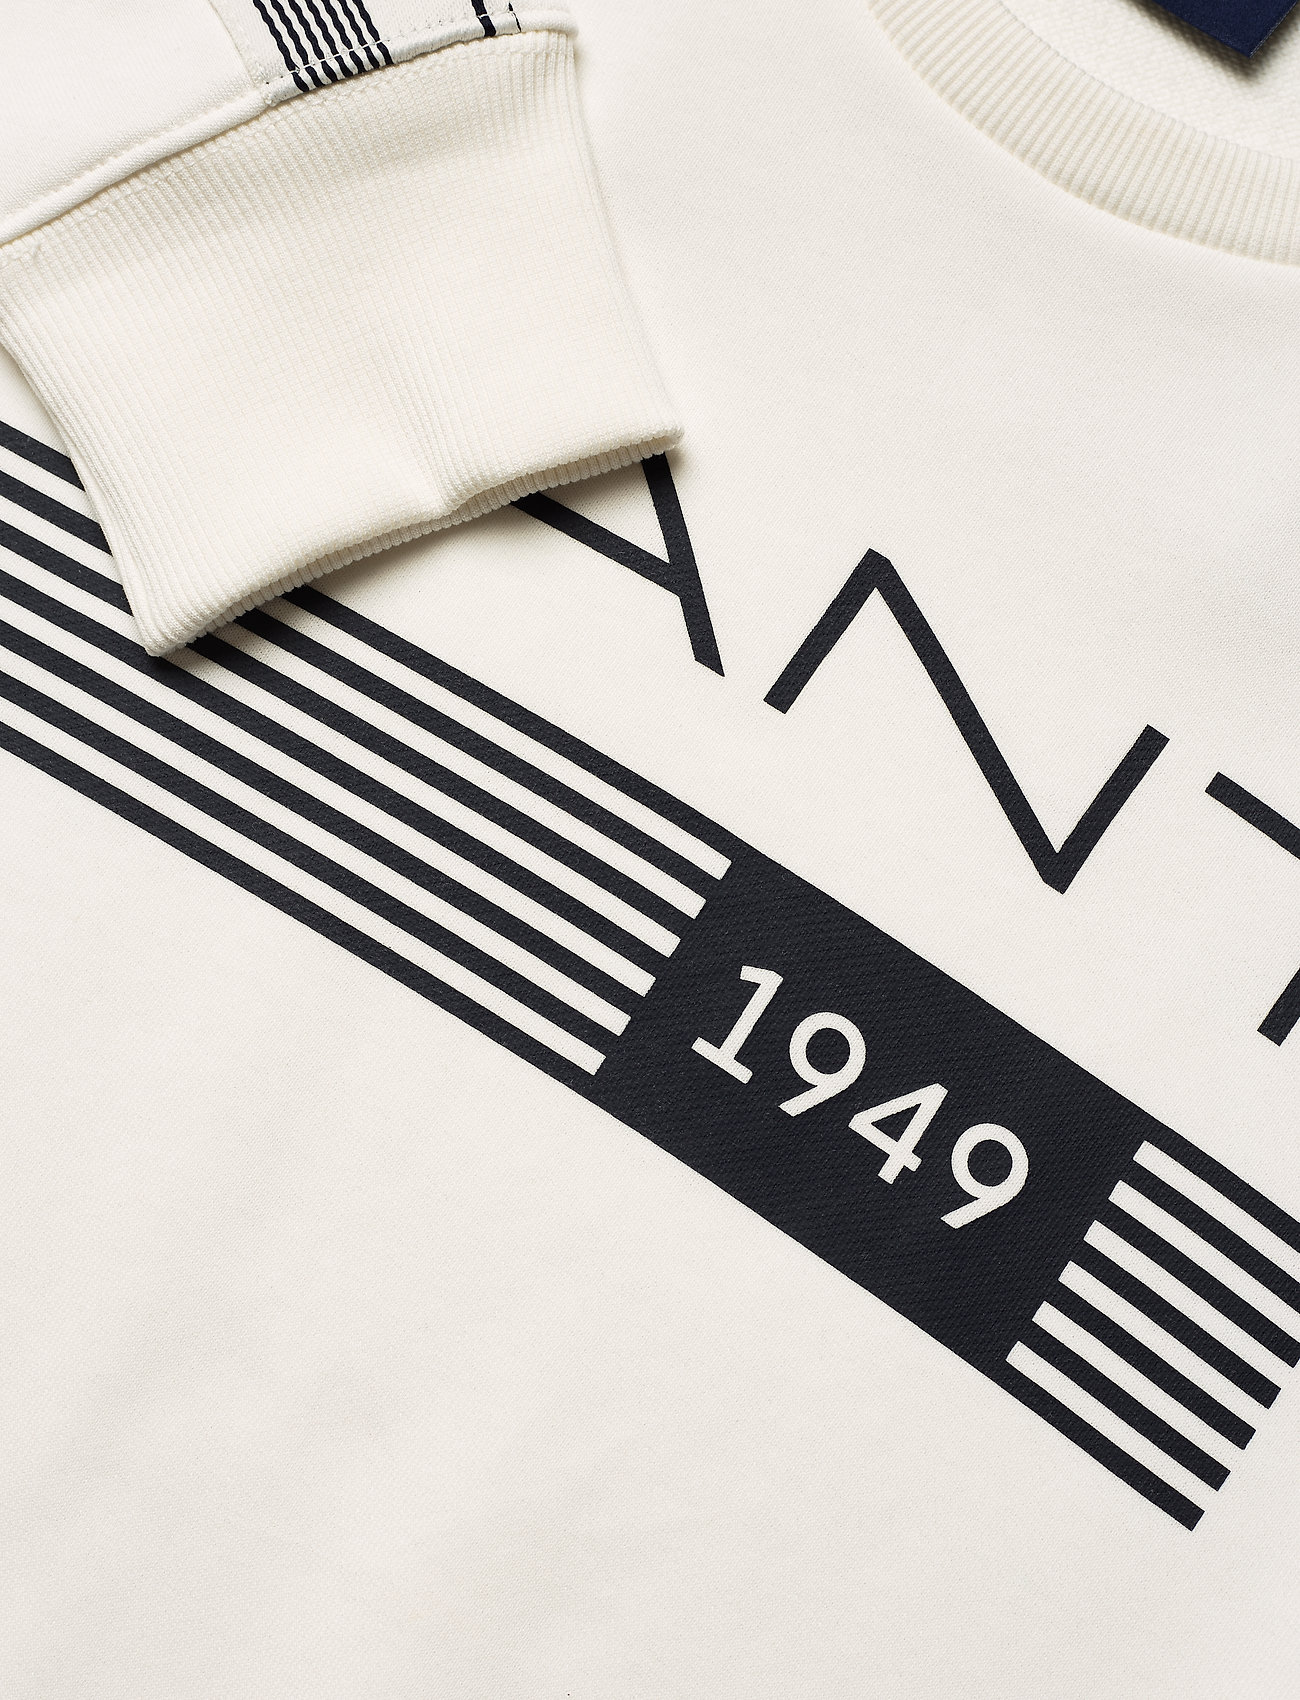 GANT D1. 13 STRIPES C-NECK SWEAT - Sweatshirts EGGSHELL - Menn Klær